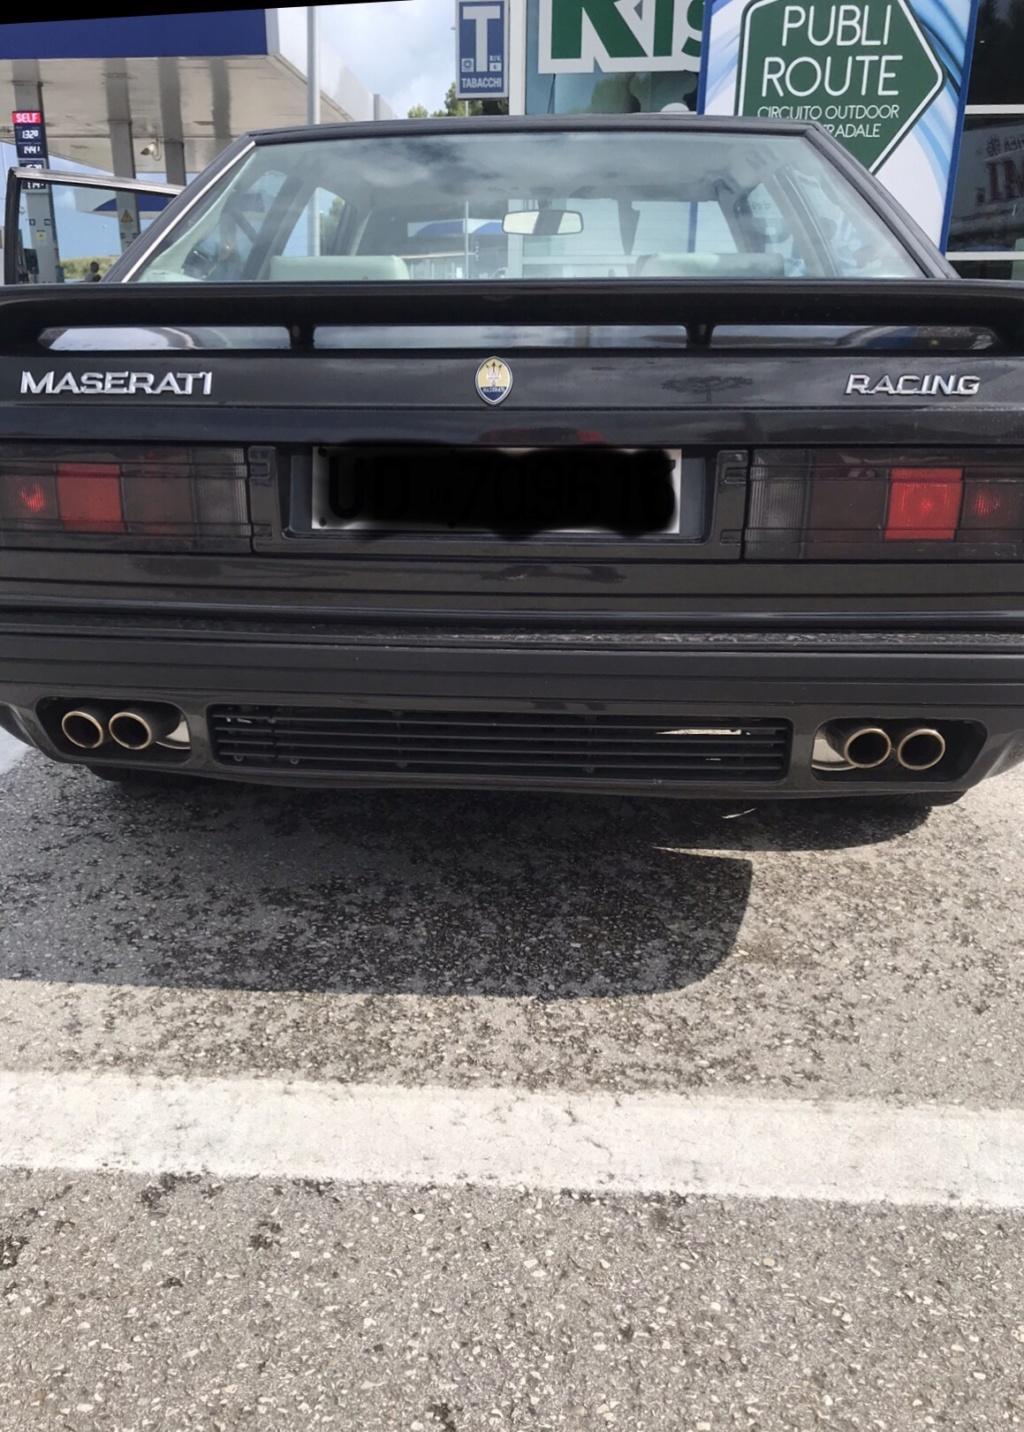 La mia prima Maserati: Racing o 3200GT? - Pagina 2 Img_4316